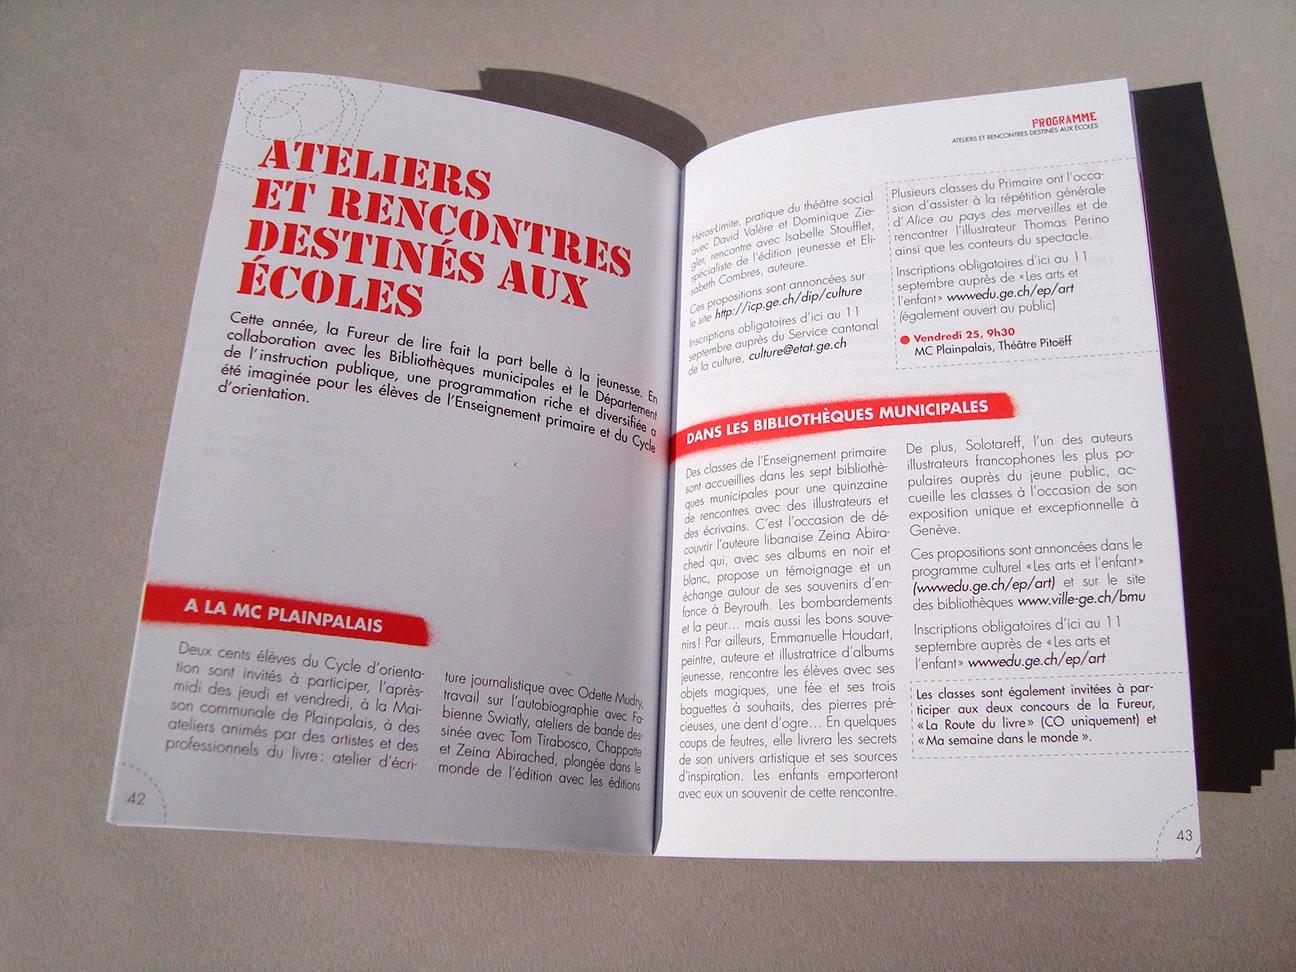 fabien_cuffel_book_festival_litteraire_fureur_lire_2009_3